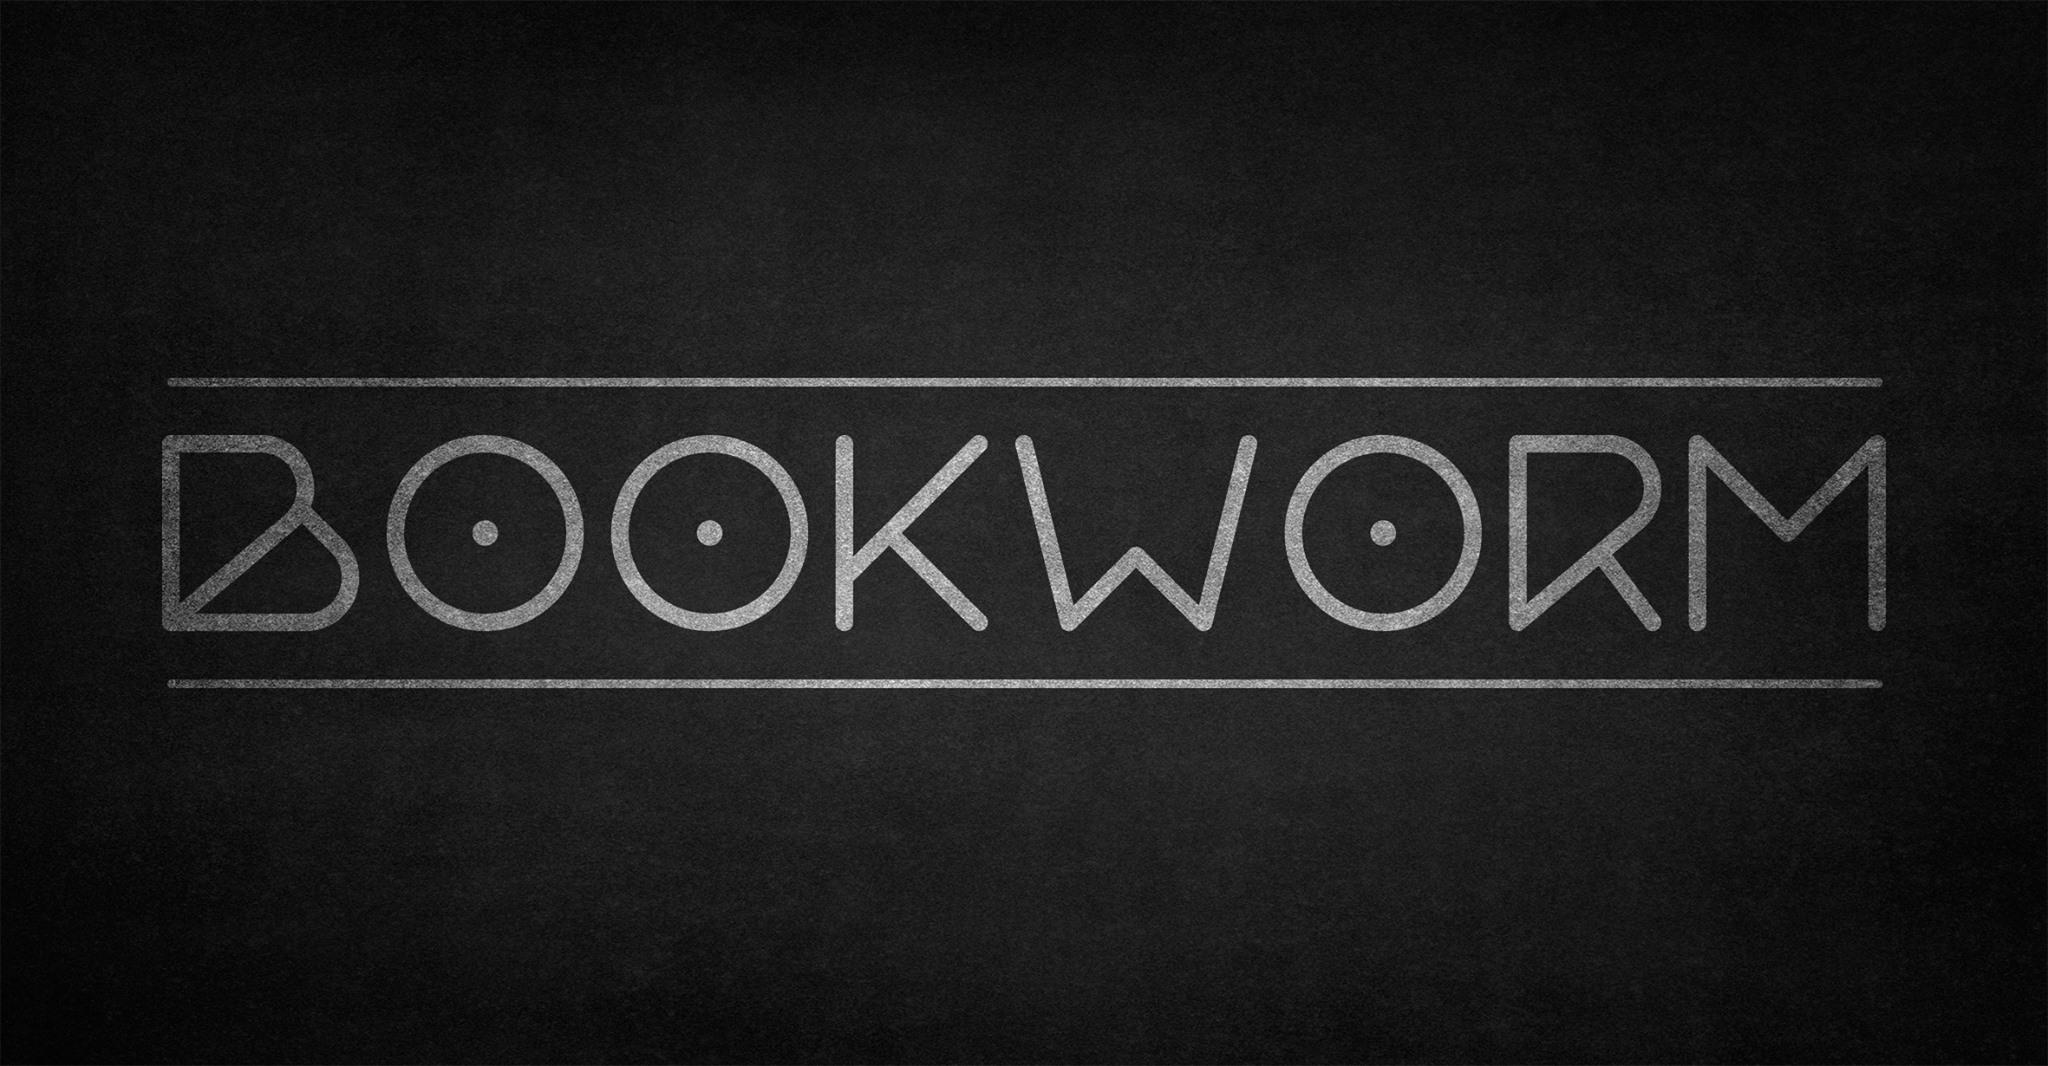 BookWorm music fest